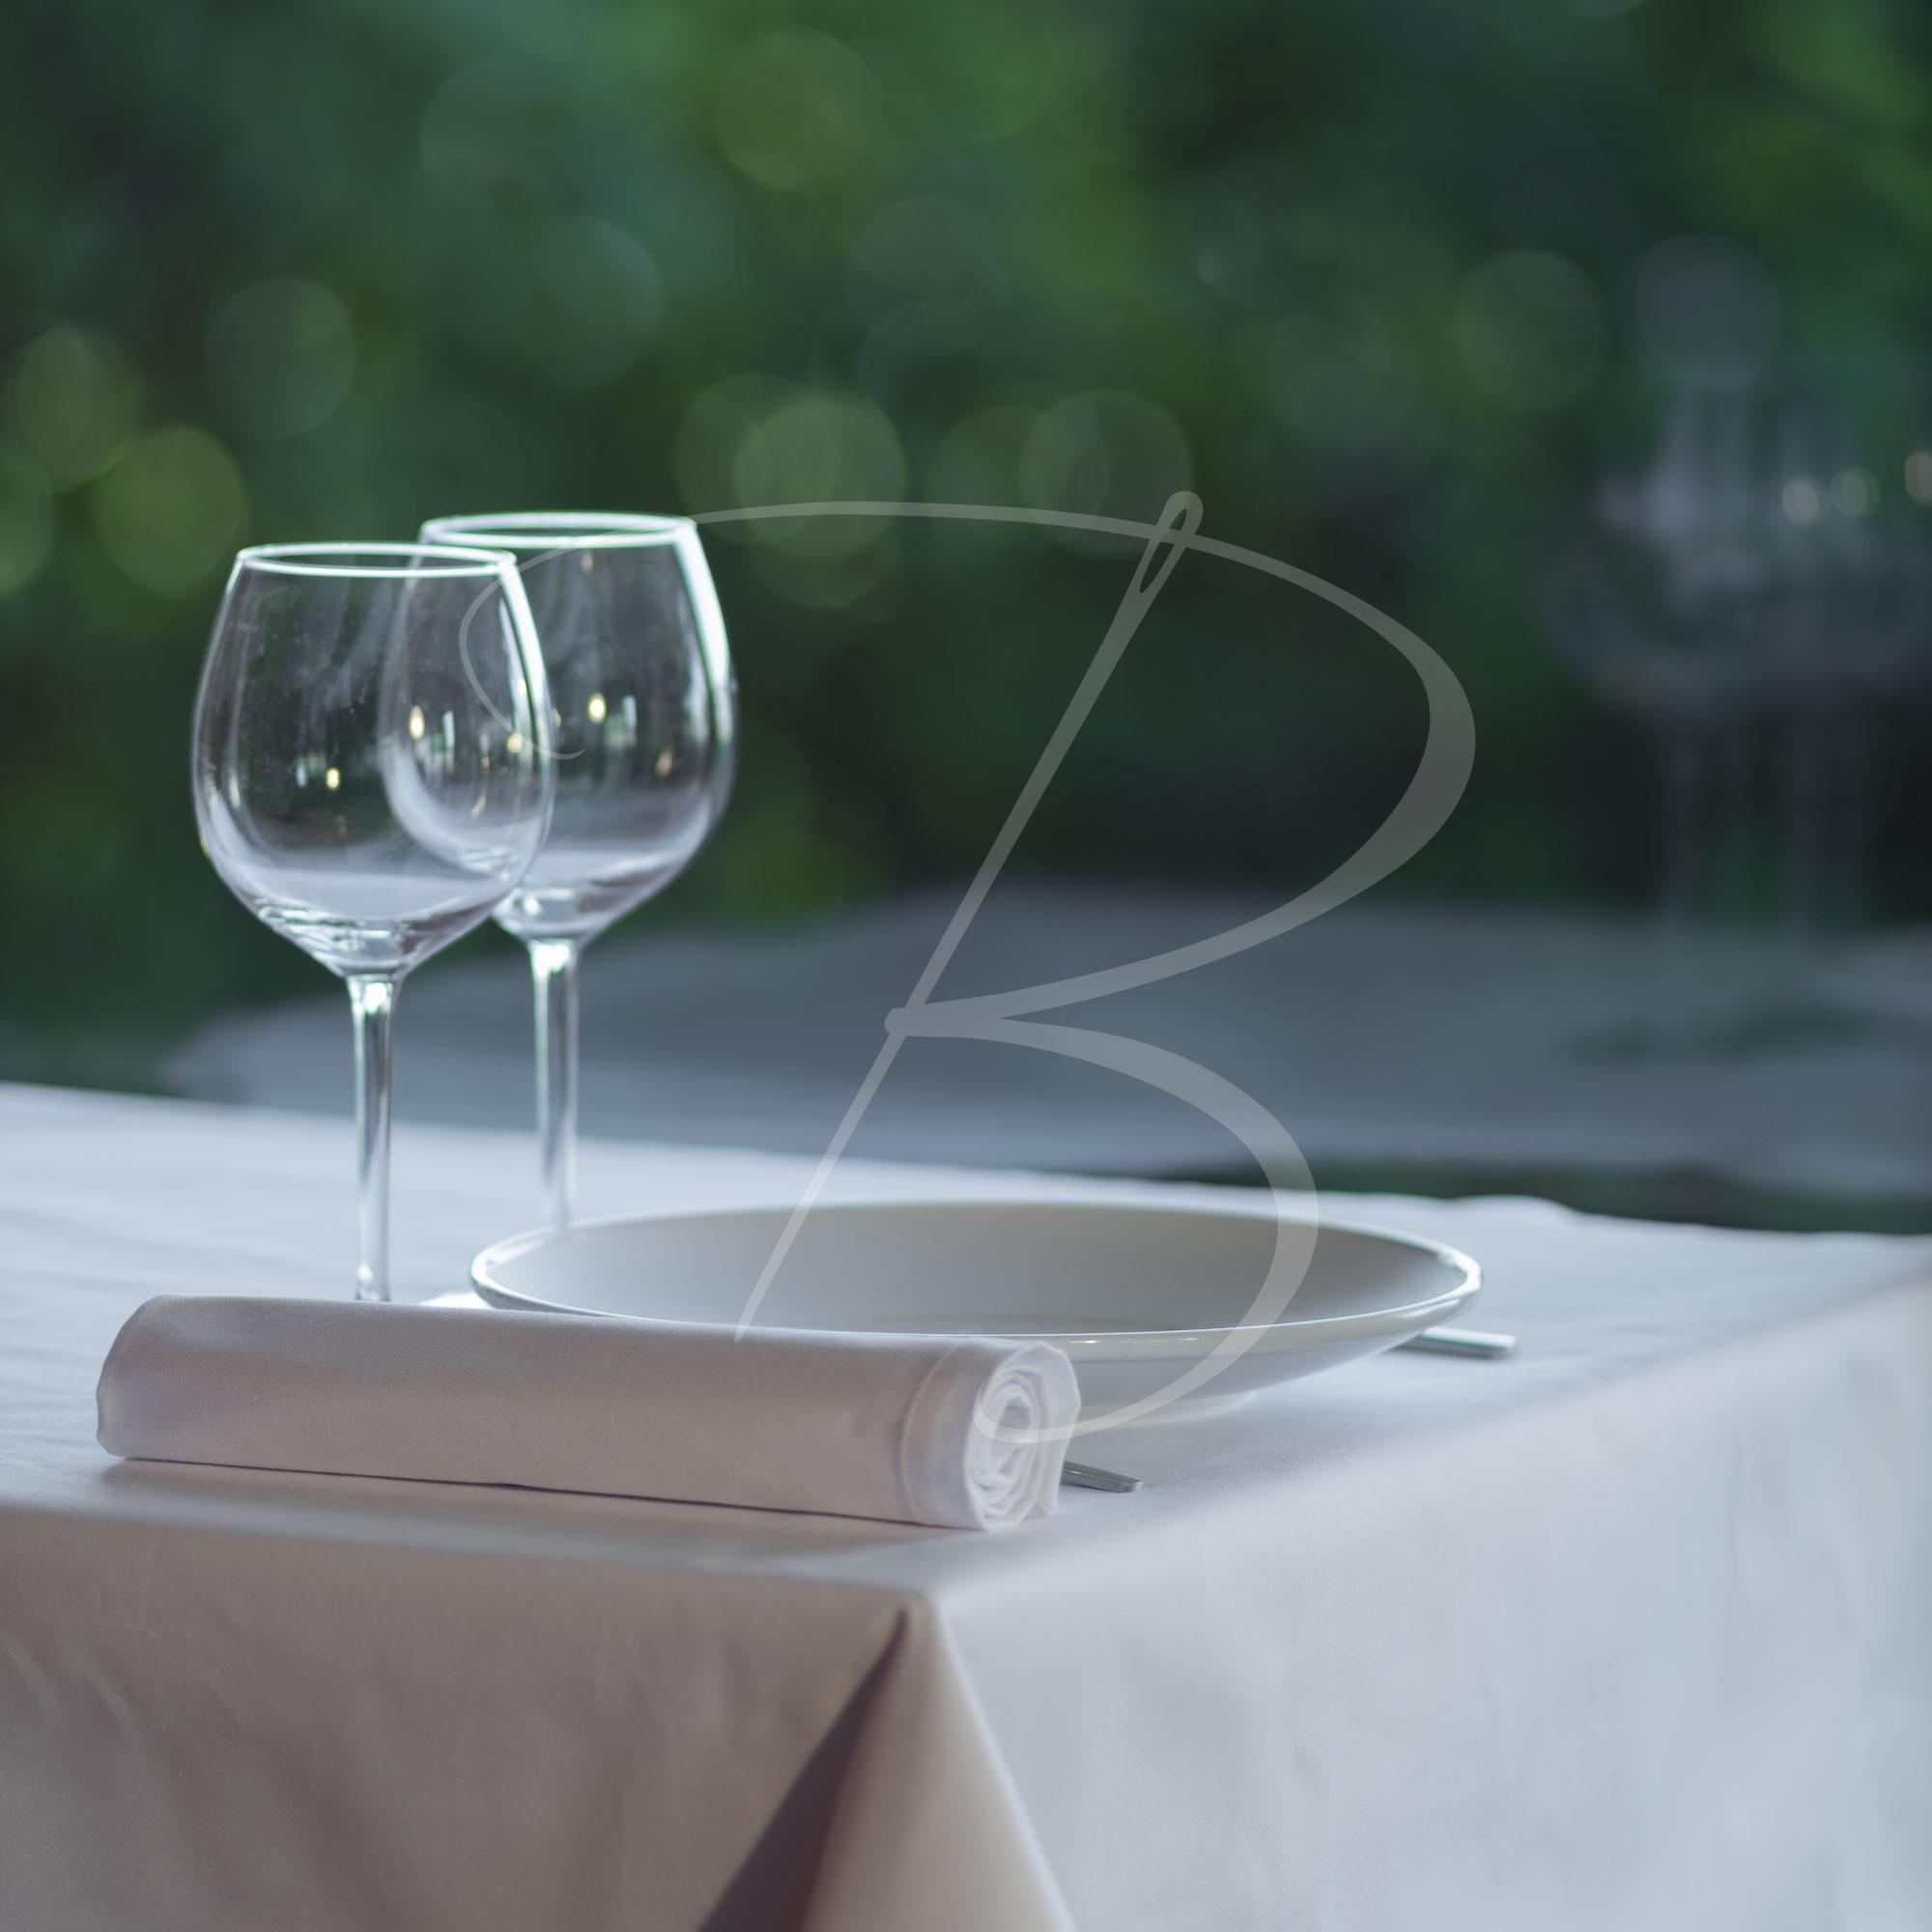 linge-table-montbazillac-coton-egypte